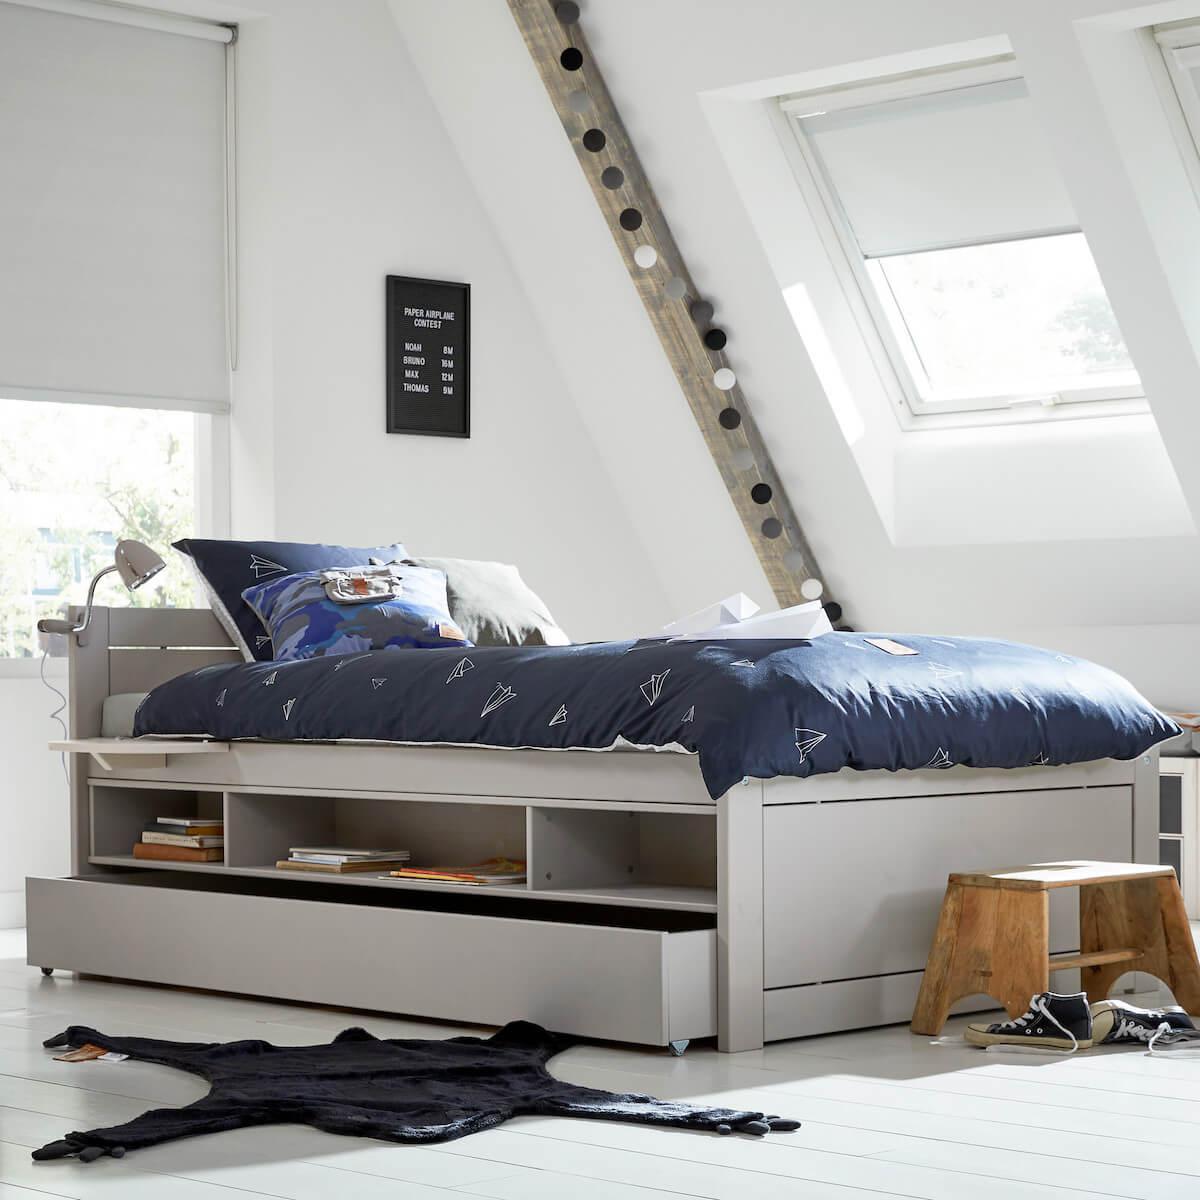 Cajón cama cabina 120x200cm Lifetime blanco